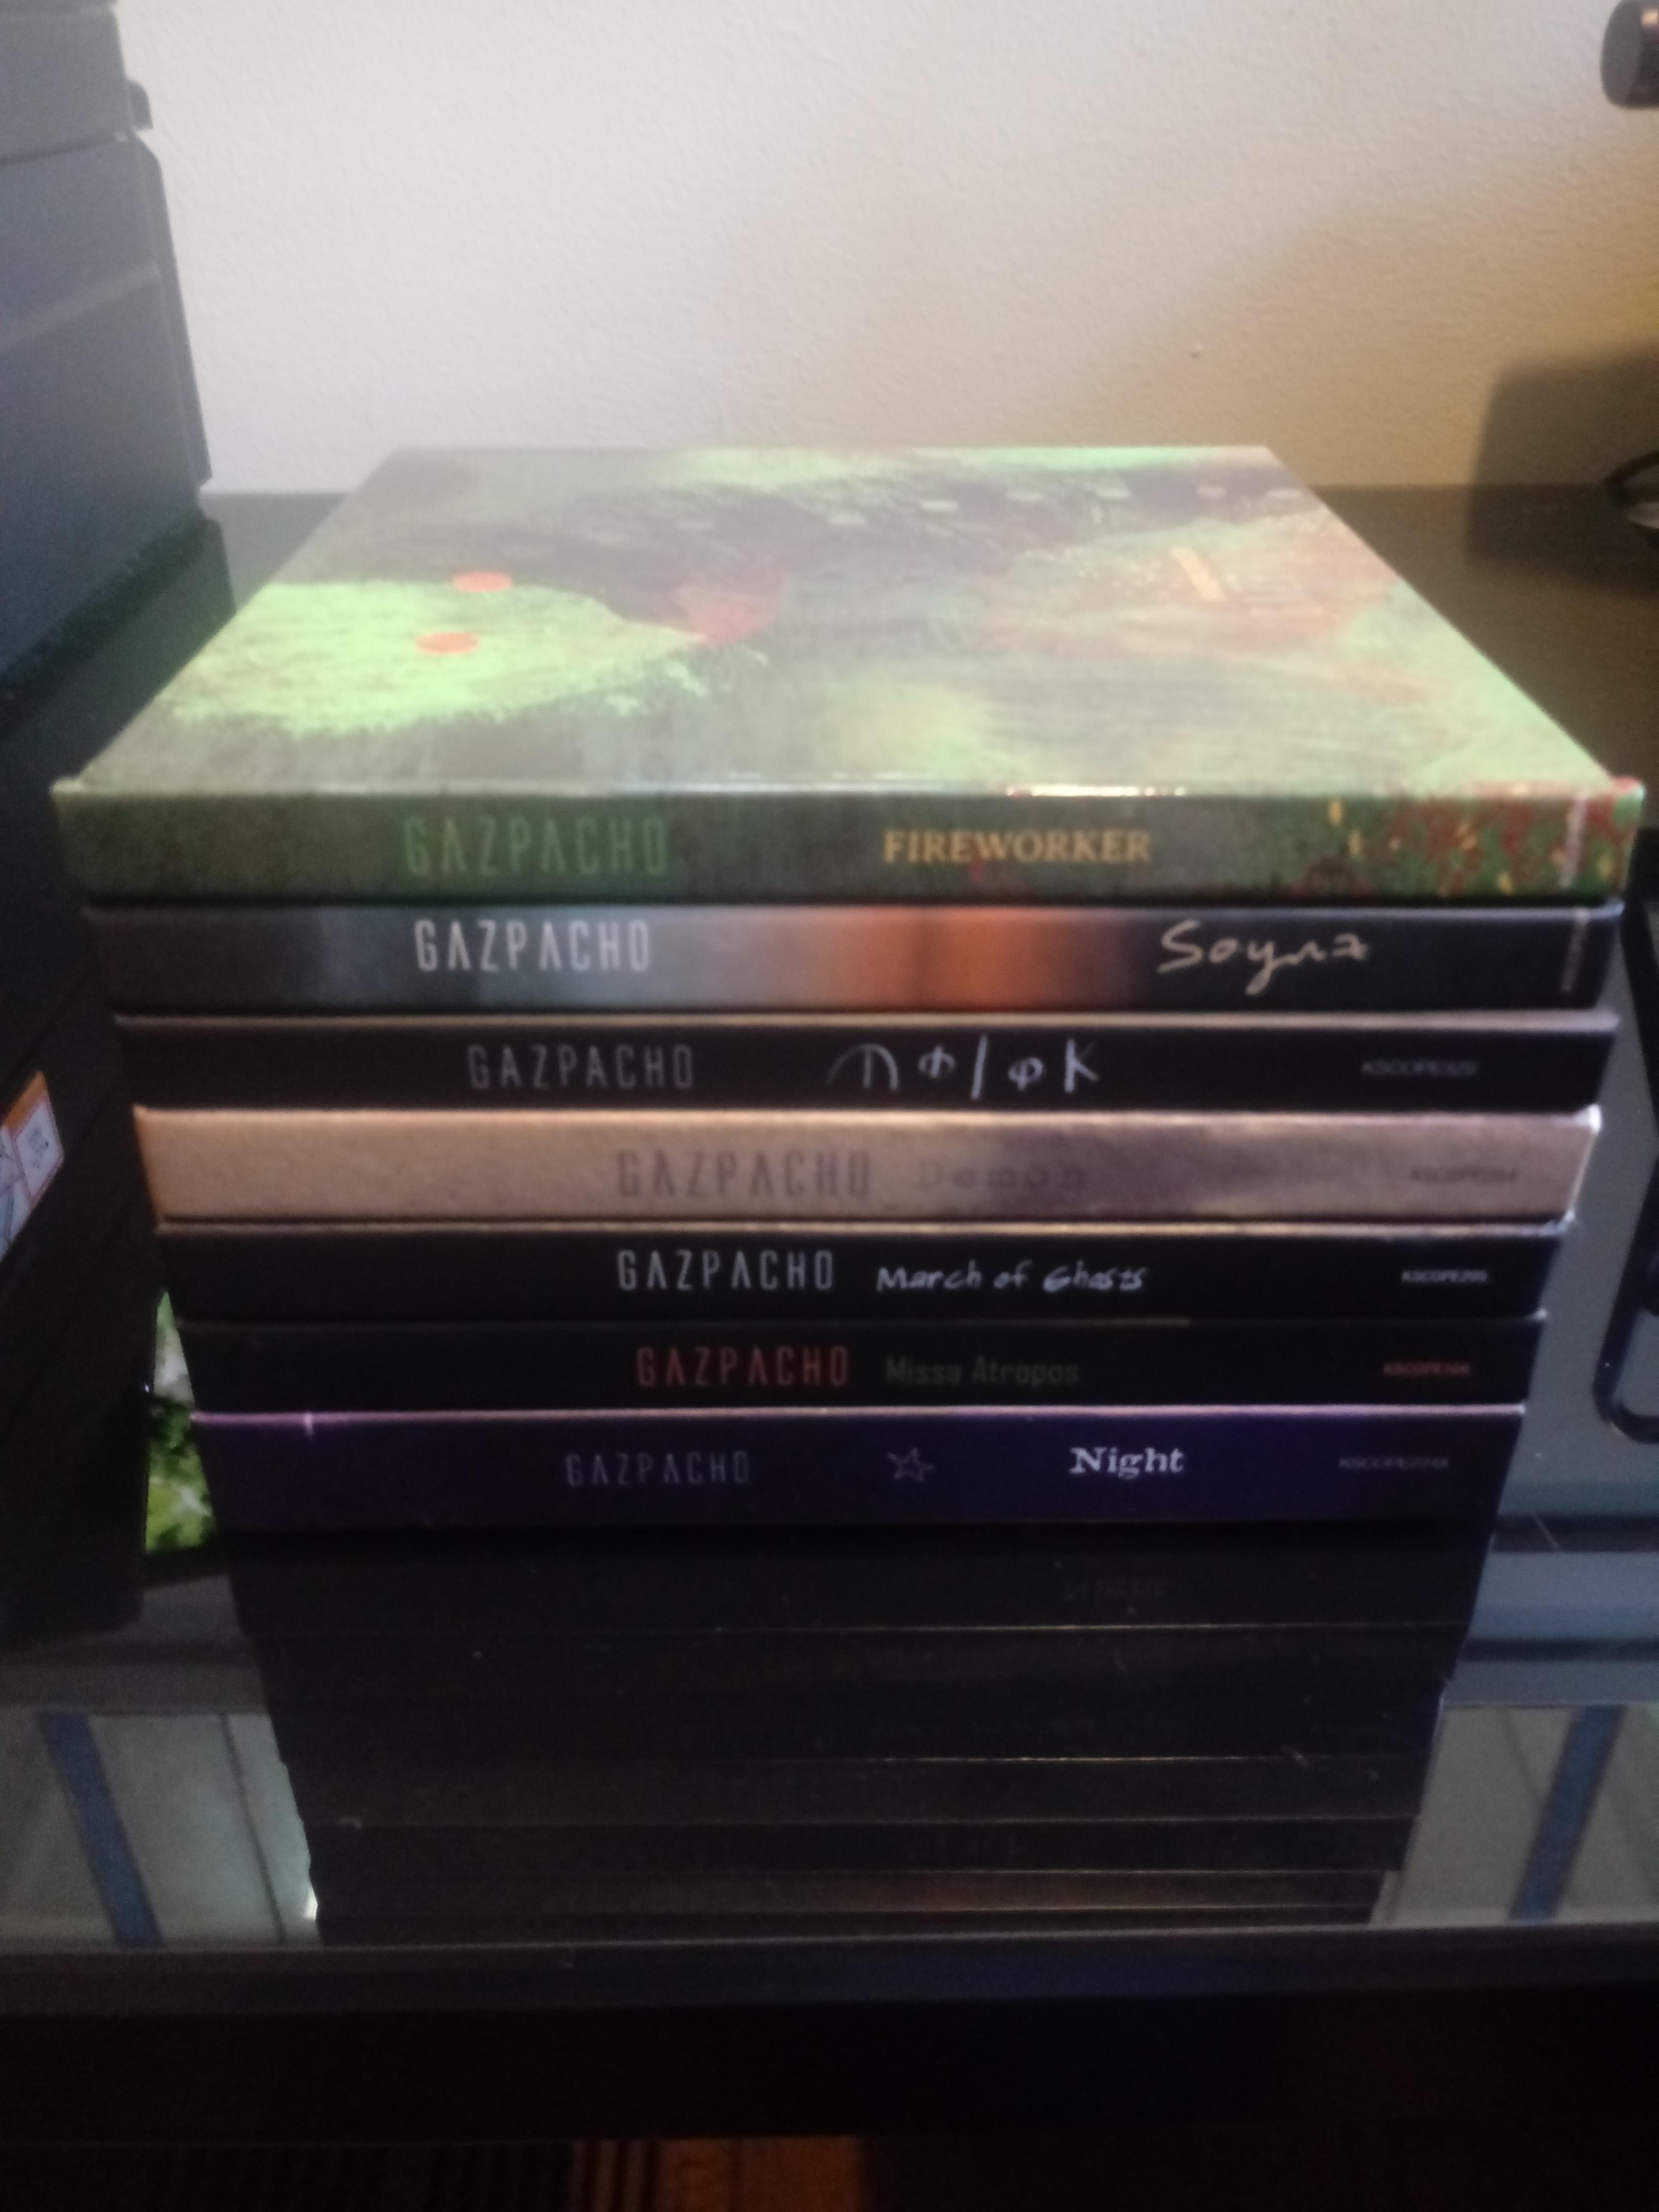 Gazpacho Discography